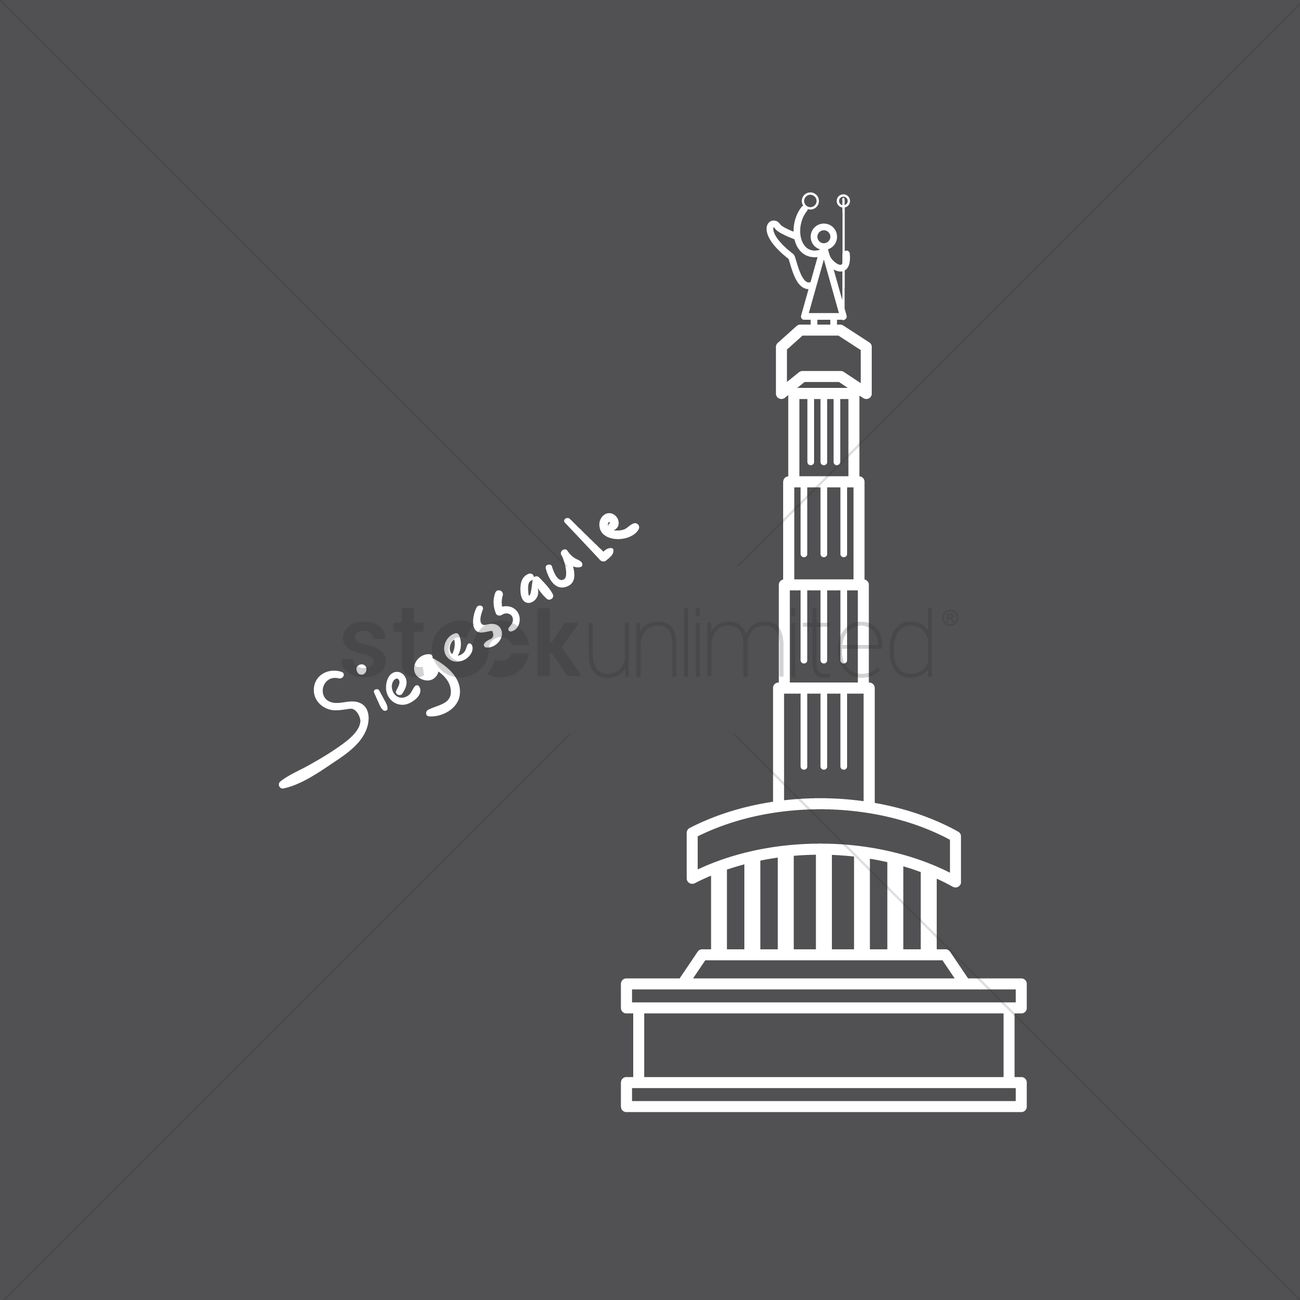 Siegessaule Vector Image.